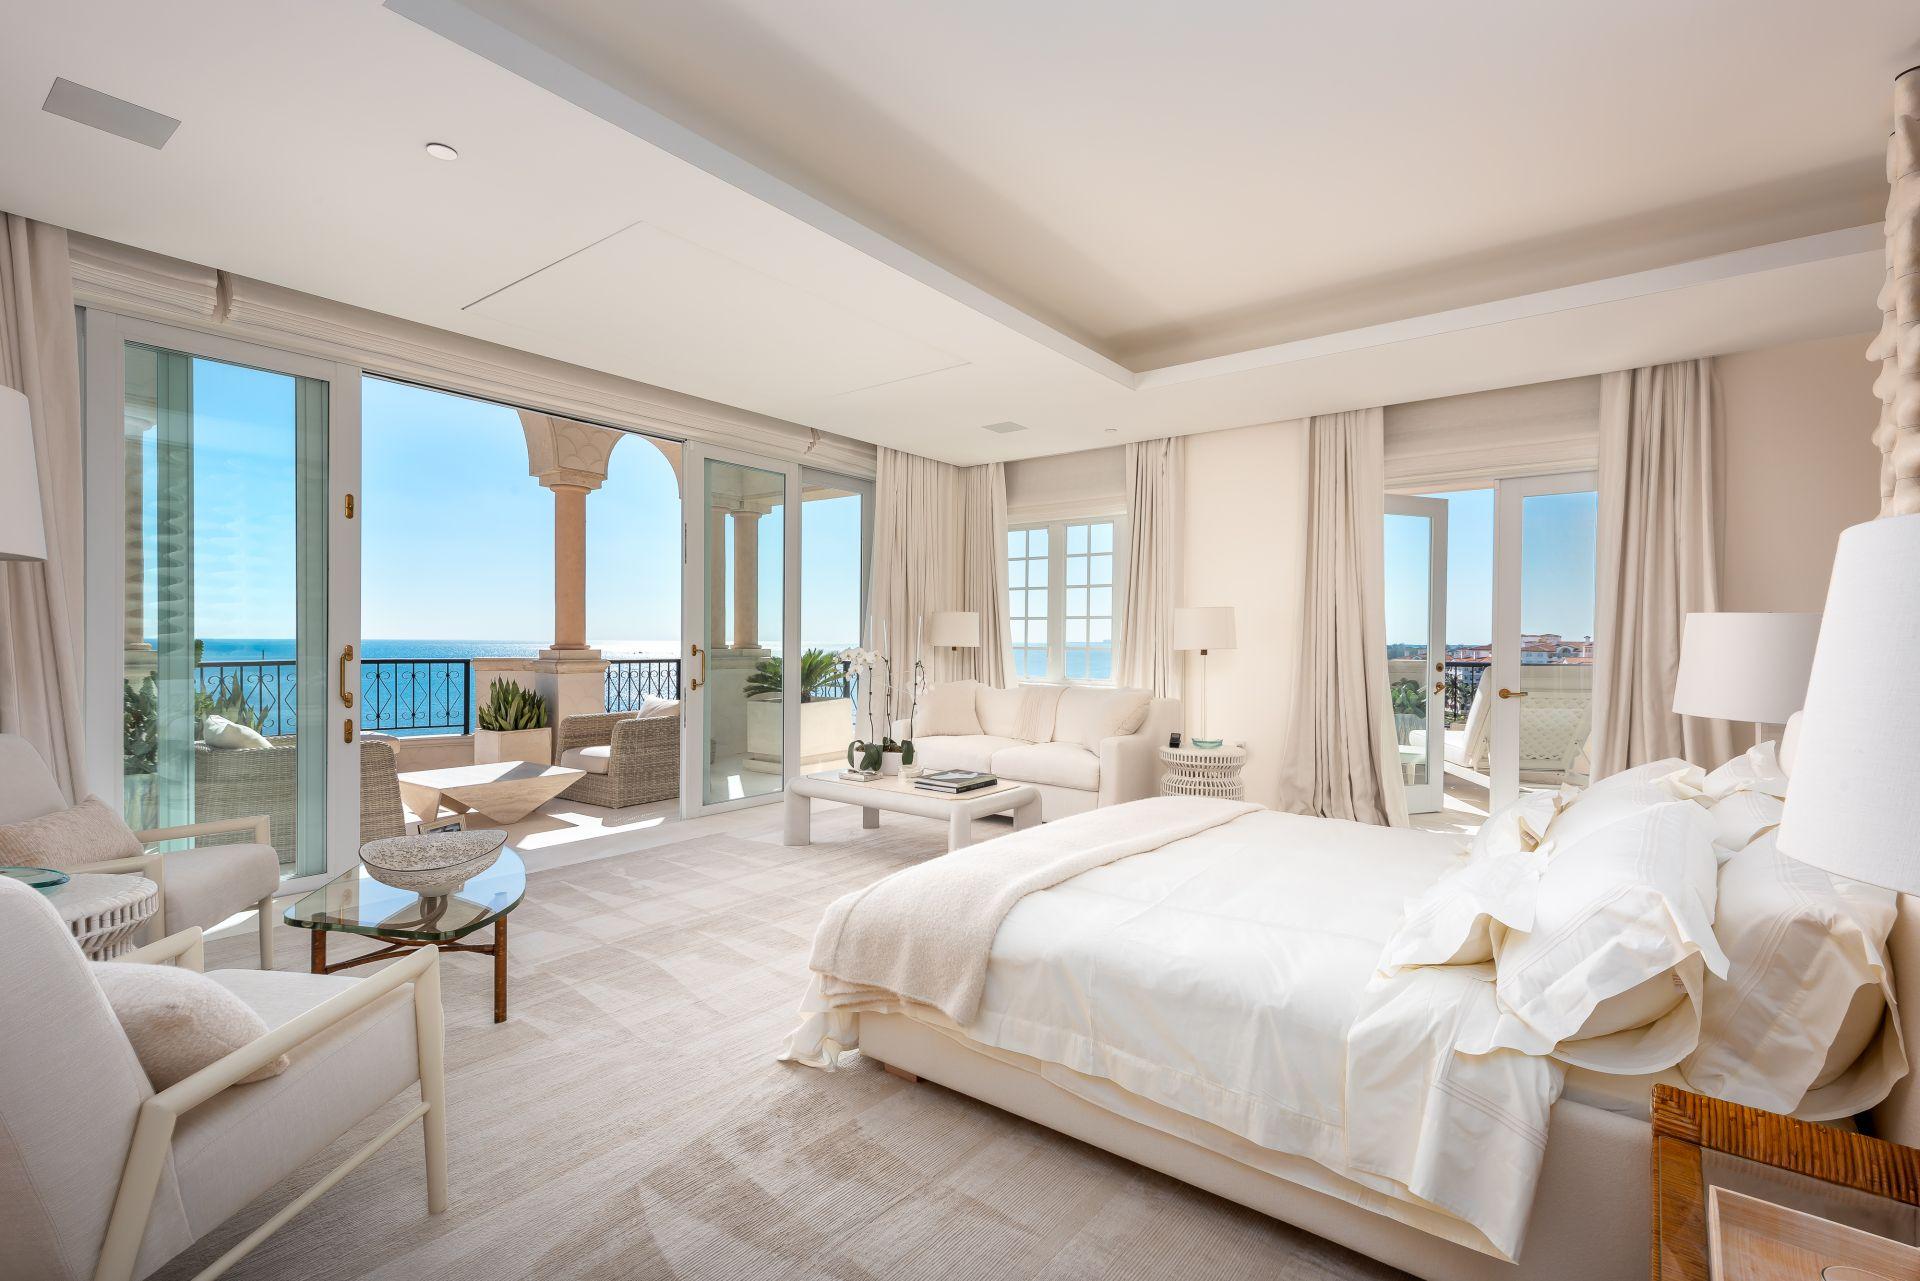 master bedroom - Oceanside PH7292 on Fisher Island